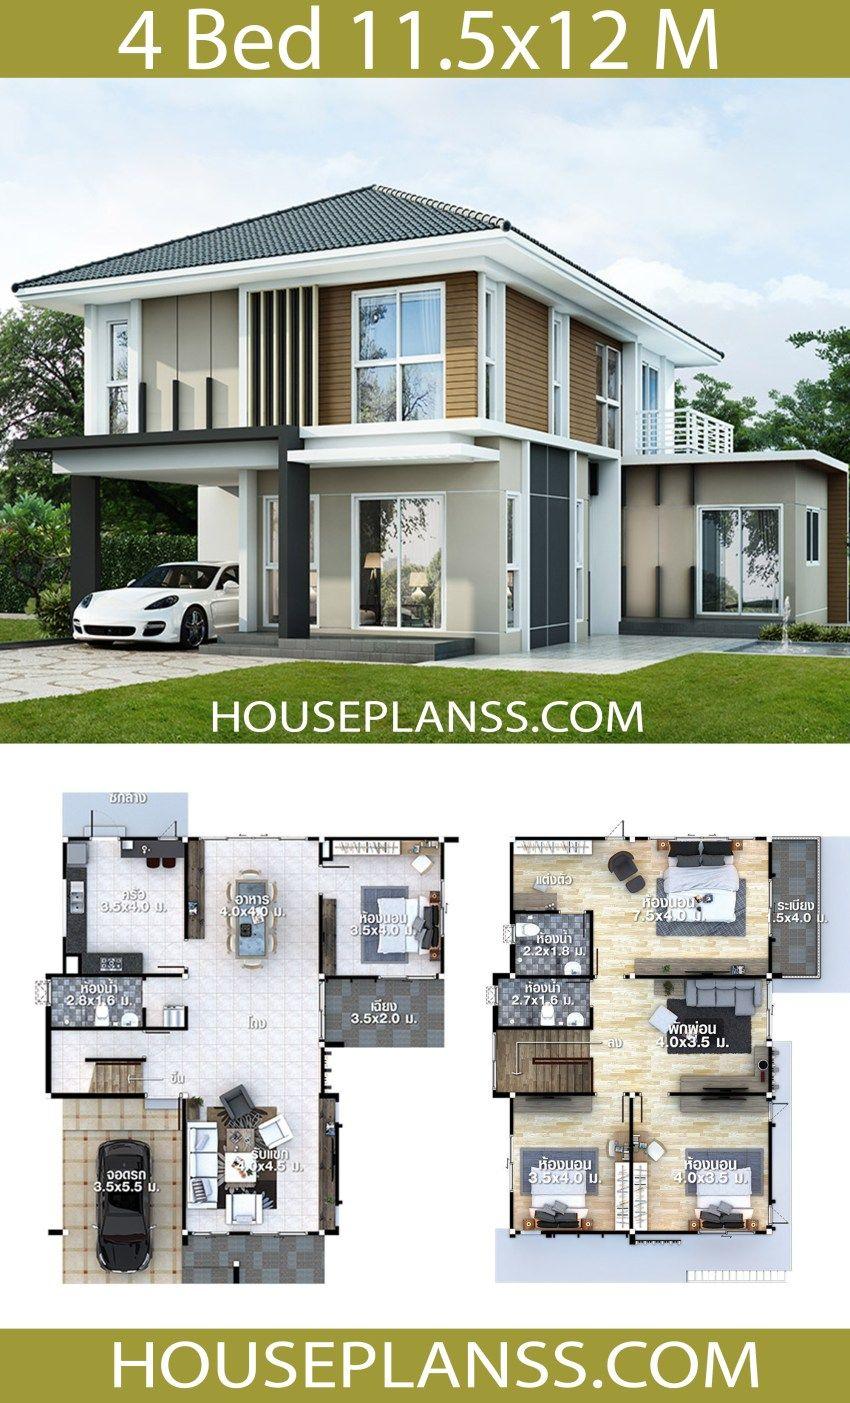 House Plans Idea 11 5x12 With 4 Bedrooms House Plans 3d Model House Plan Modern House Facades Architect Design House